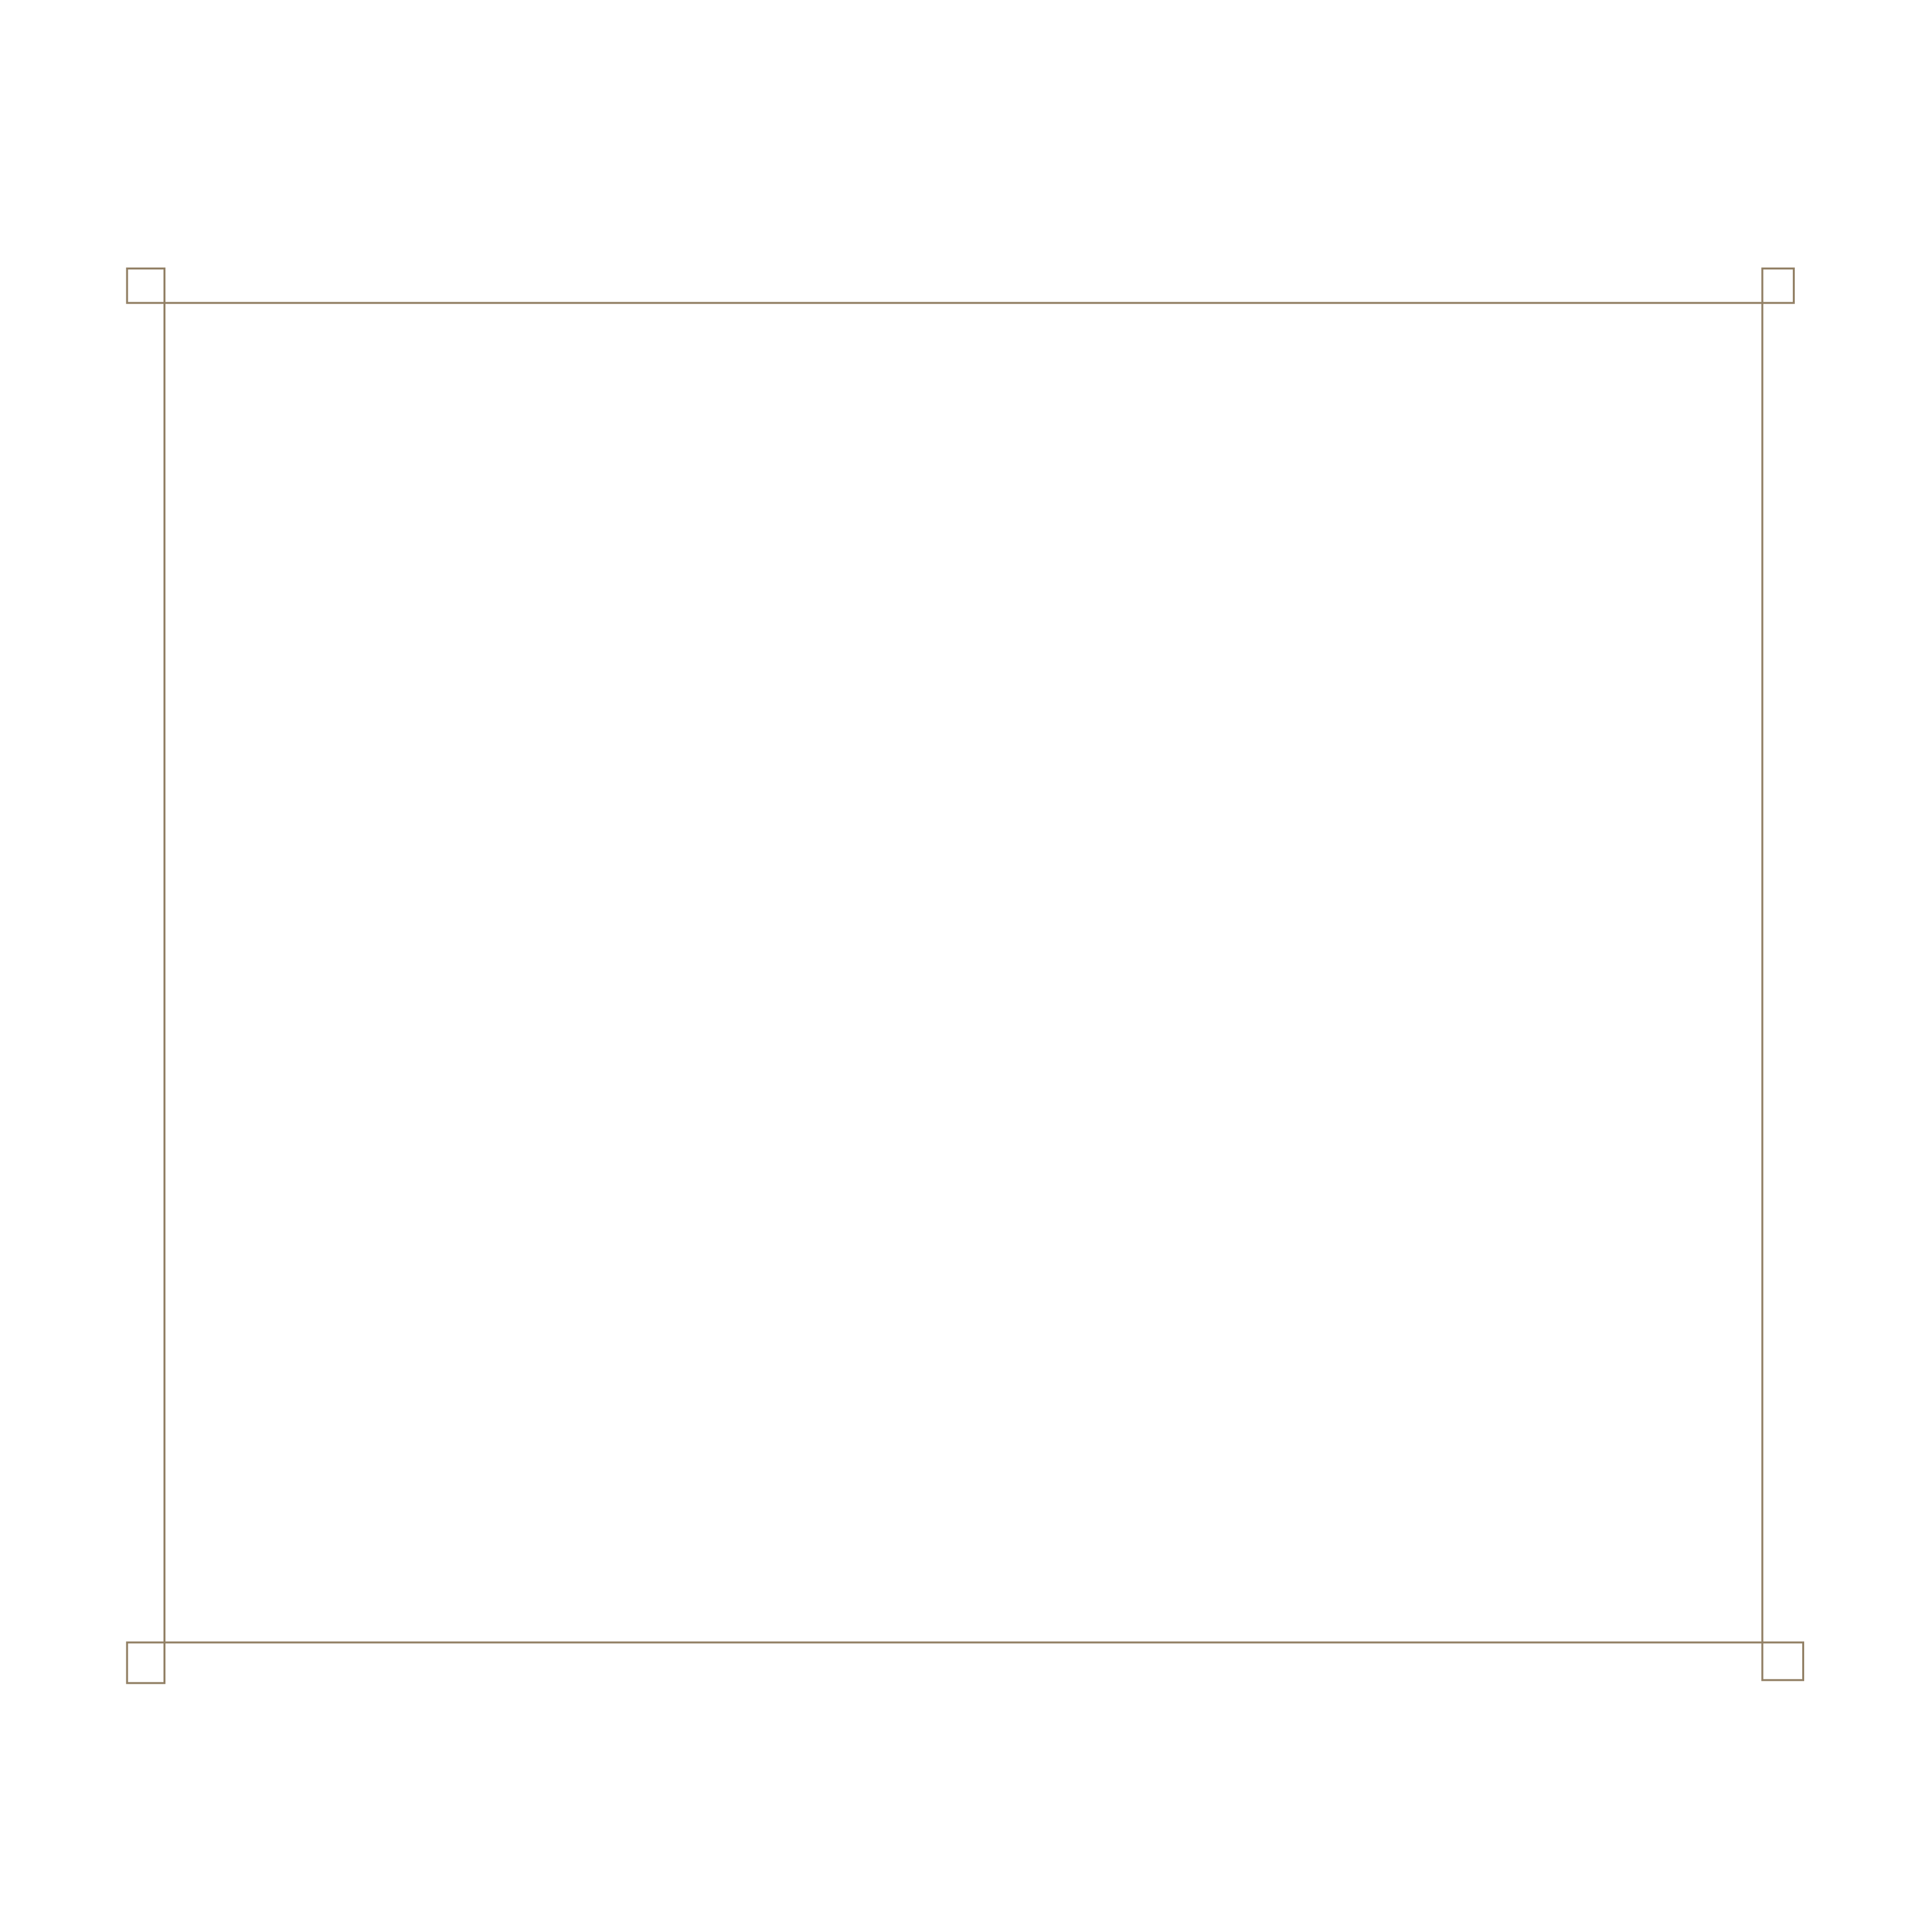 Frame hd mart. White border png